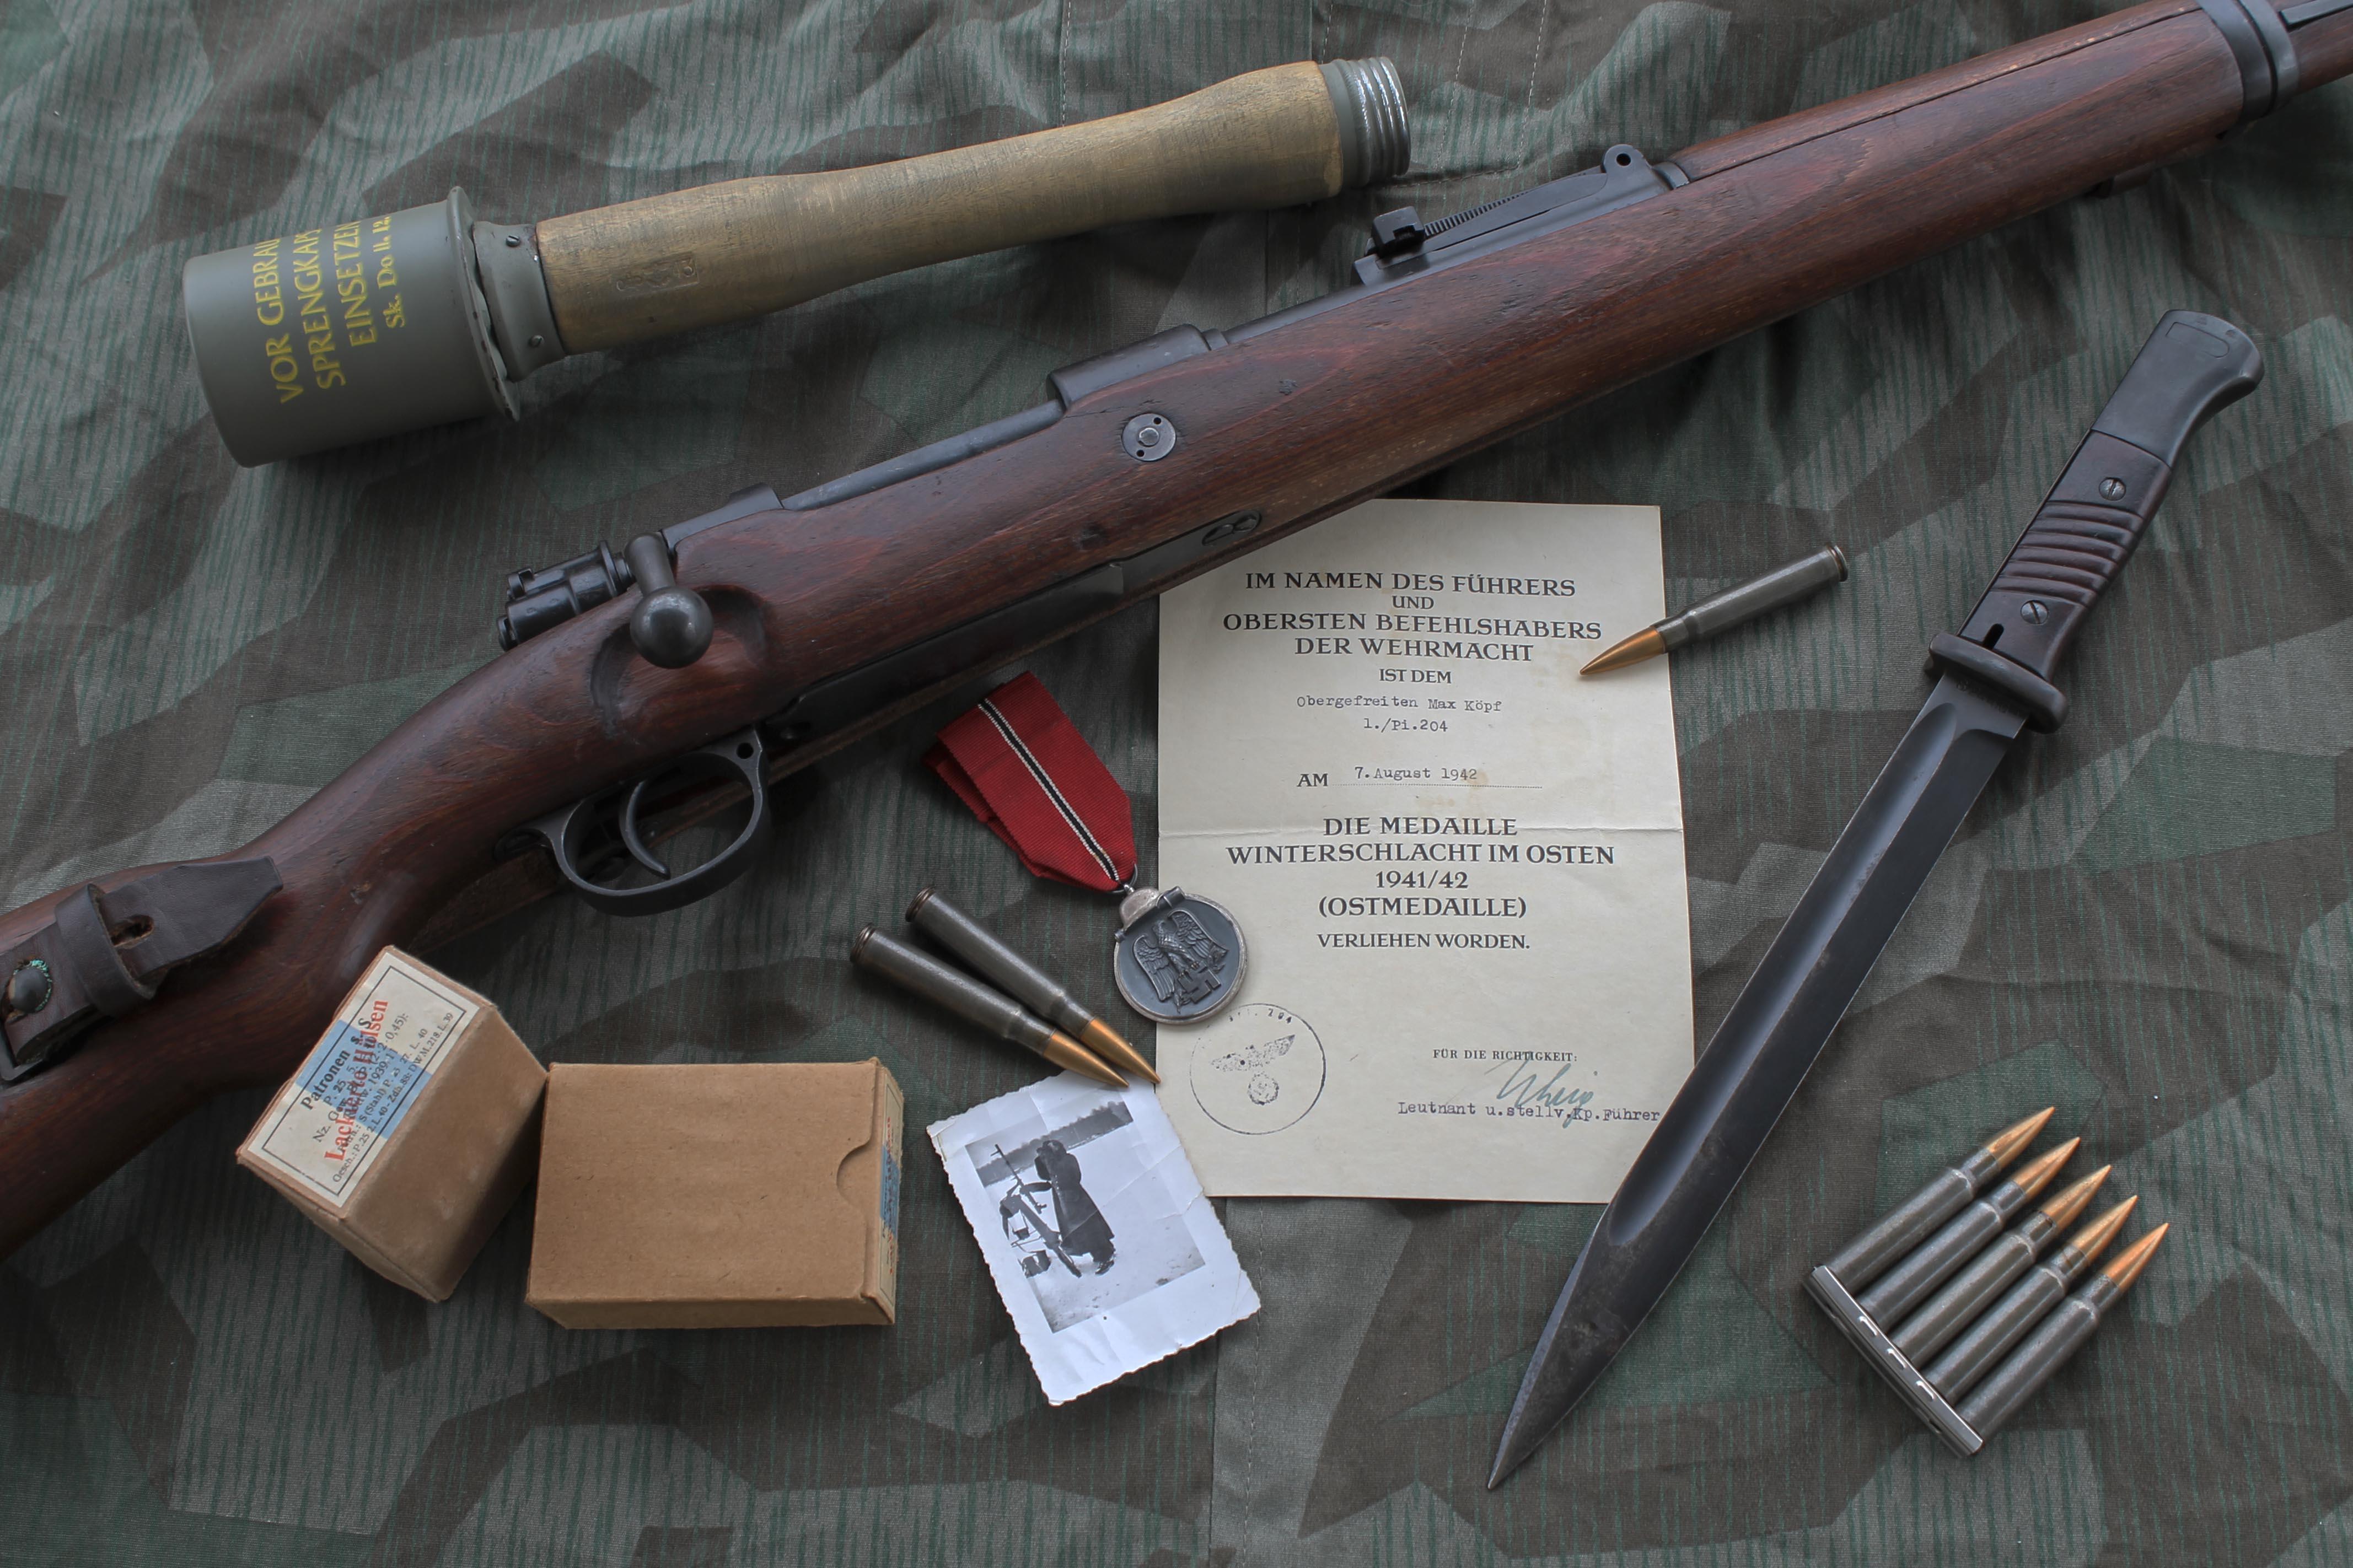 k98 mauser rifle 4k ultra hd wallpaper background image